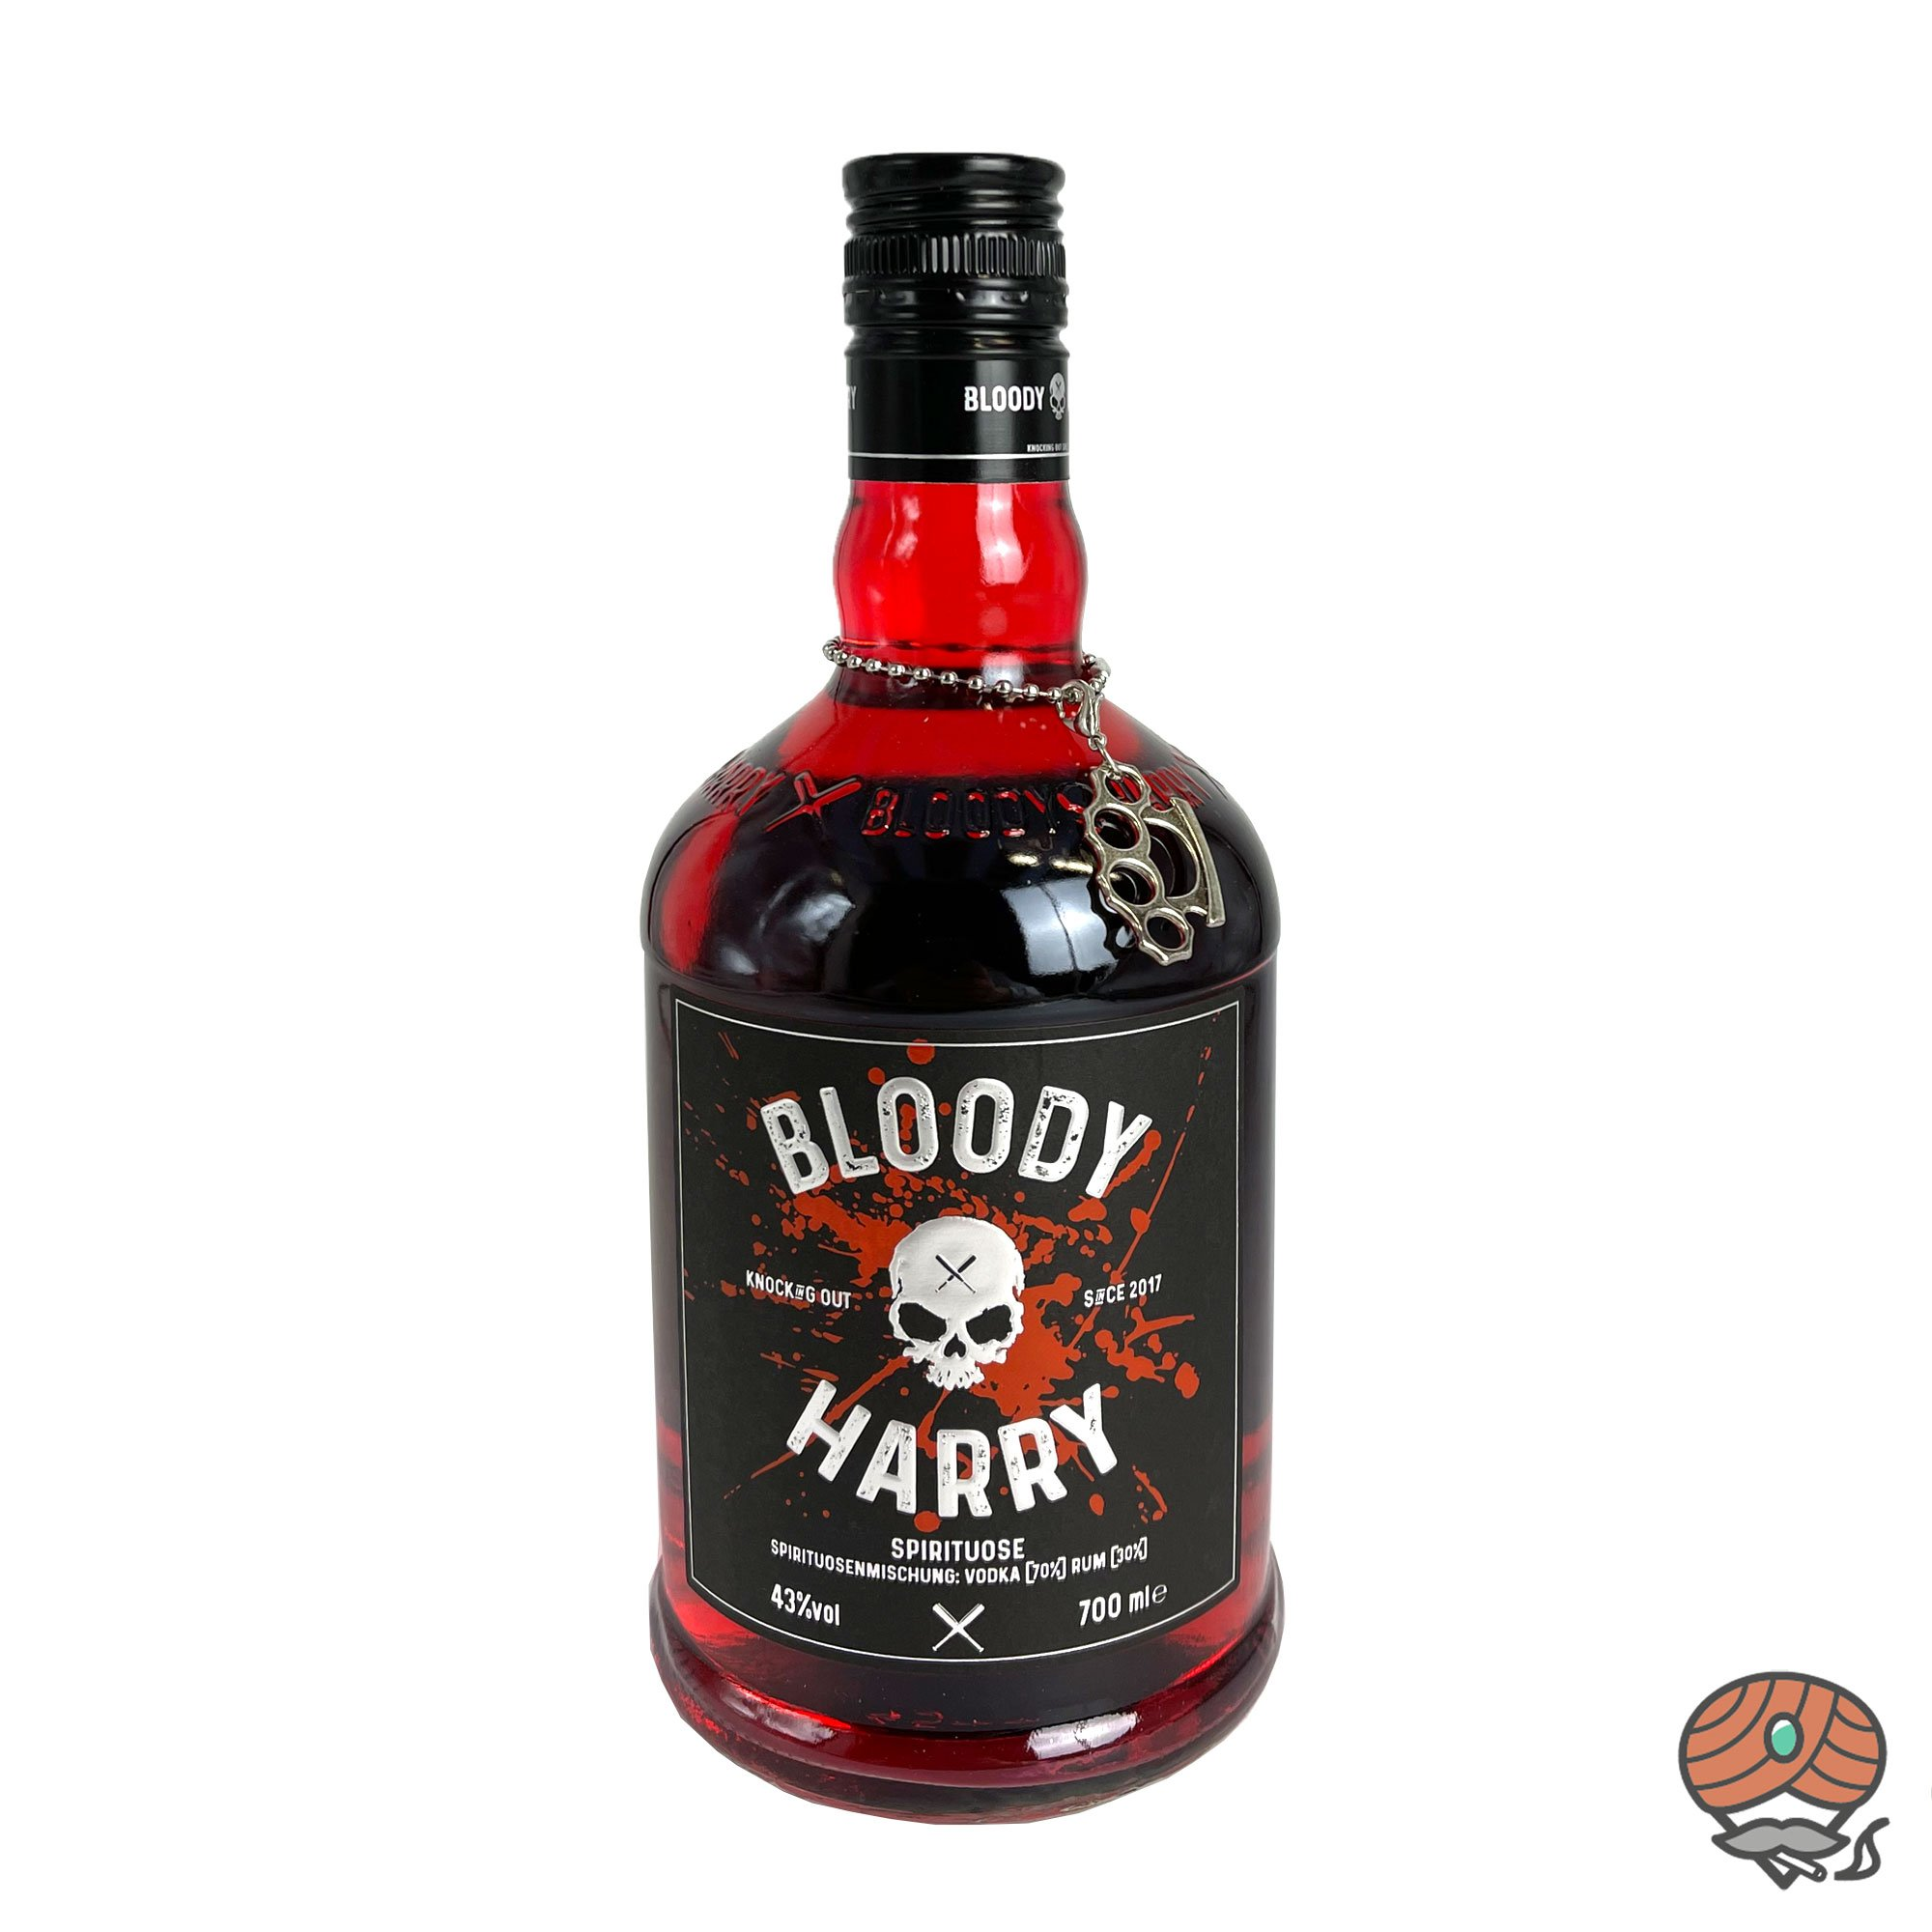 Bloody Harry Vodka + Rum 0,7 l, alc. 43 Vol.-%